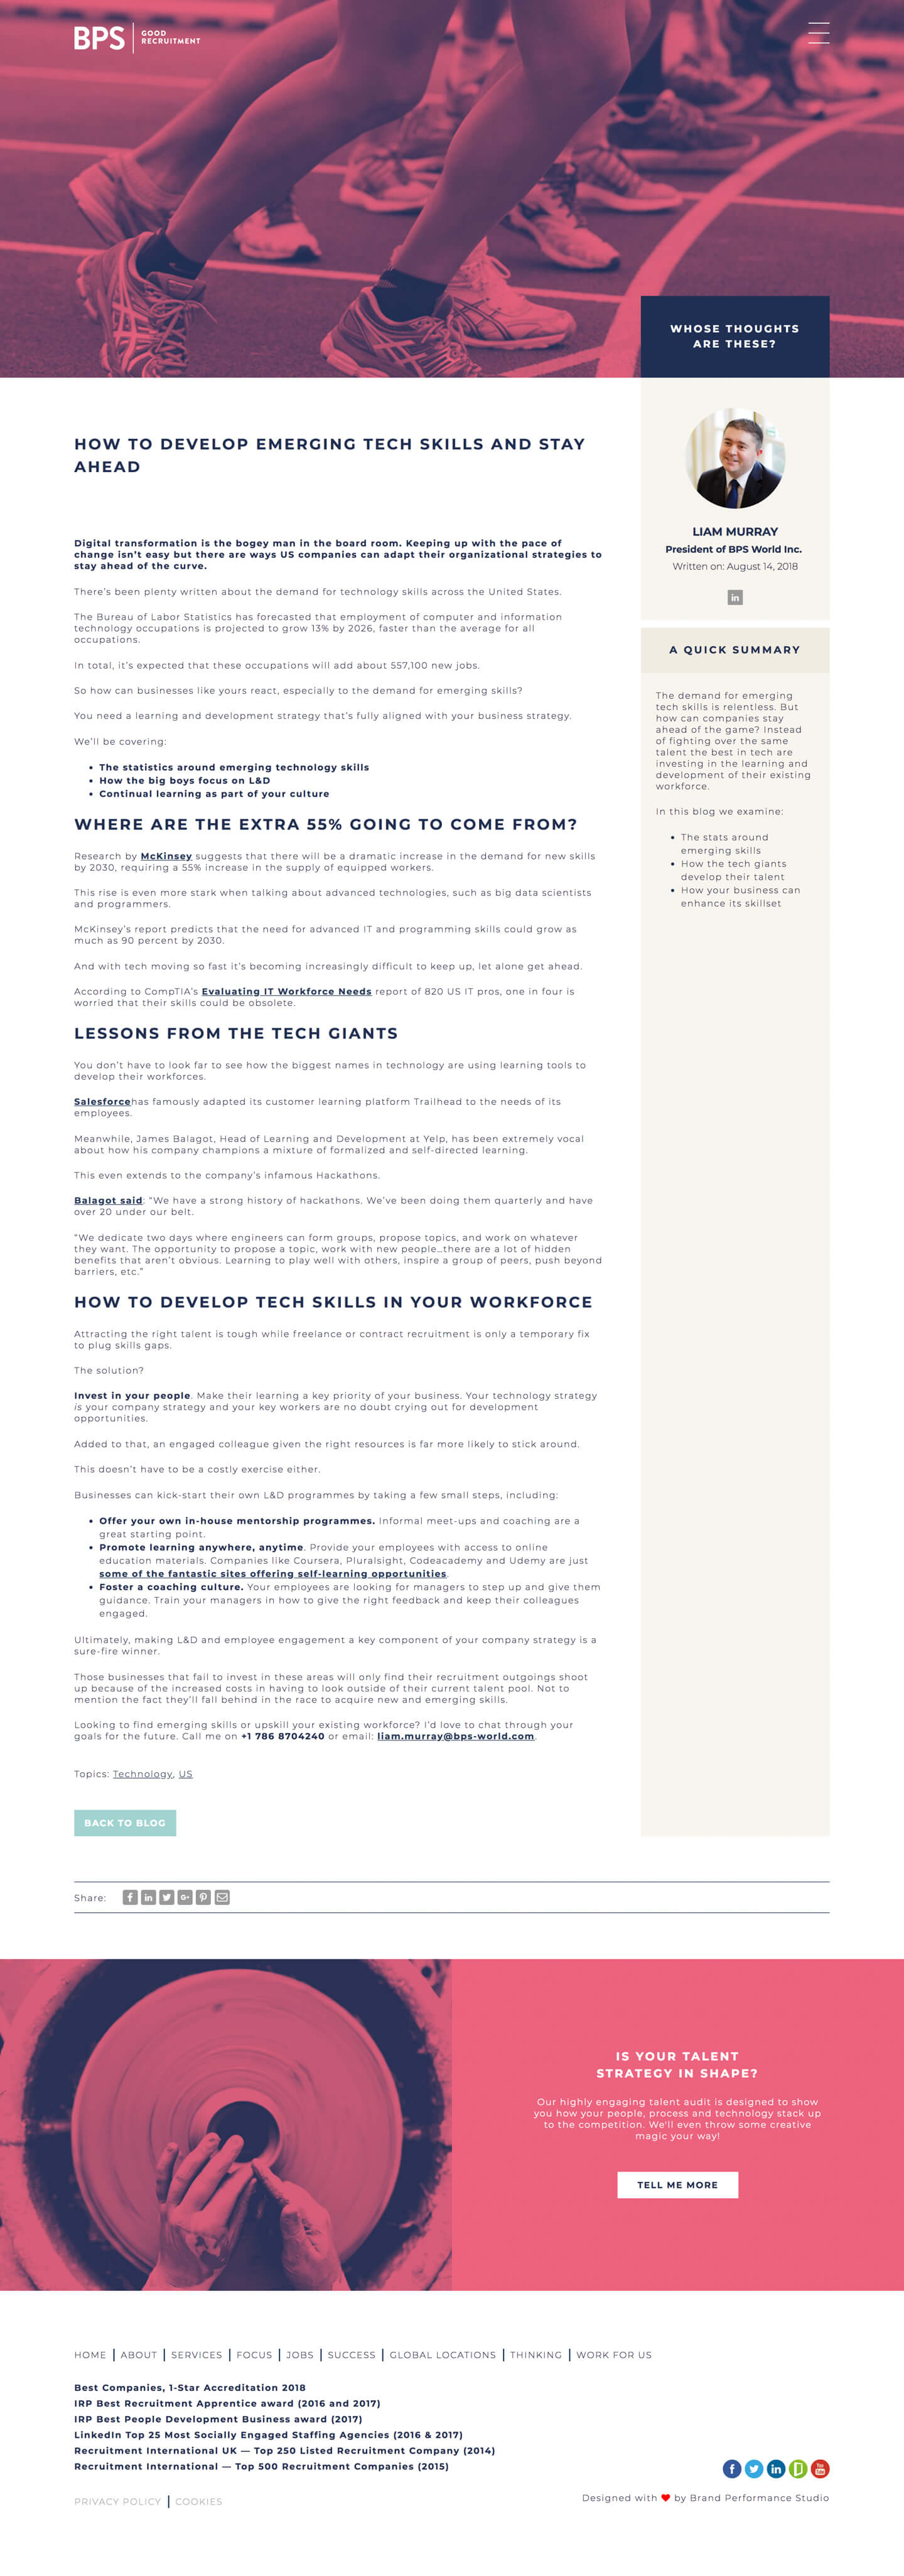 Blog Post View |  BPS-World Ltd. - Screenshot